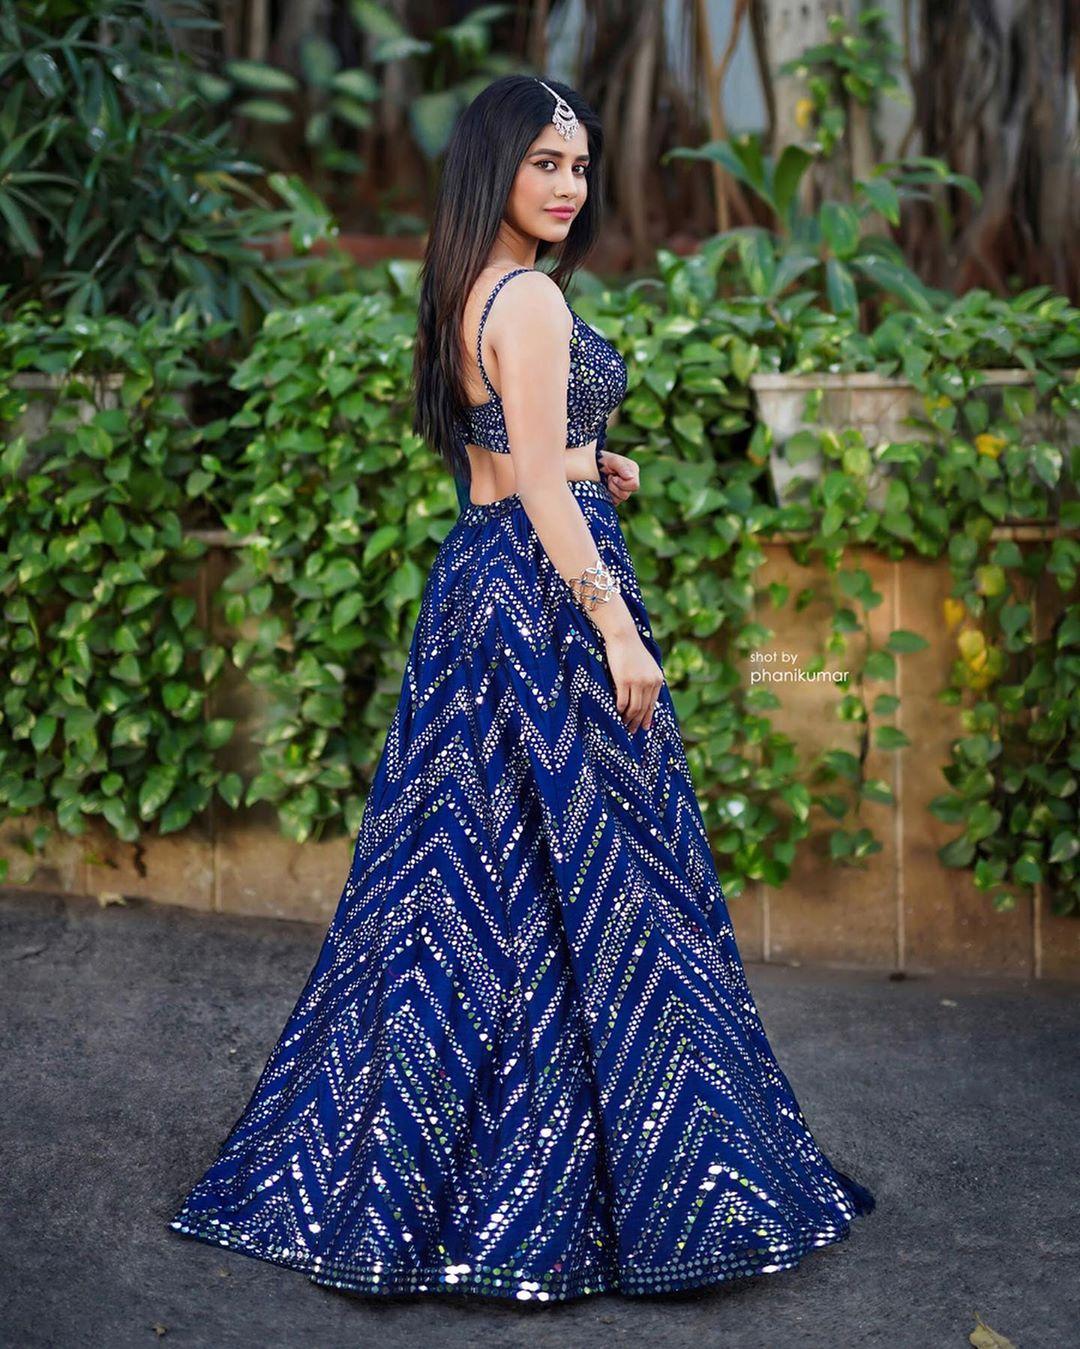 Nabha Natesh hot images and latest movie news